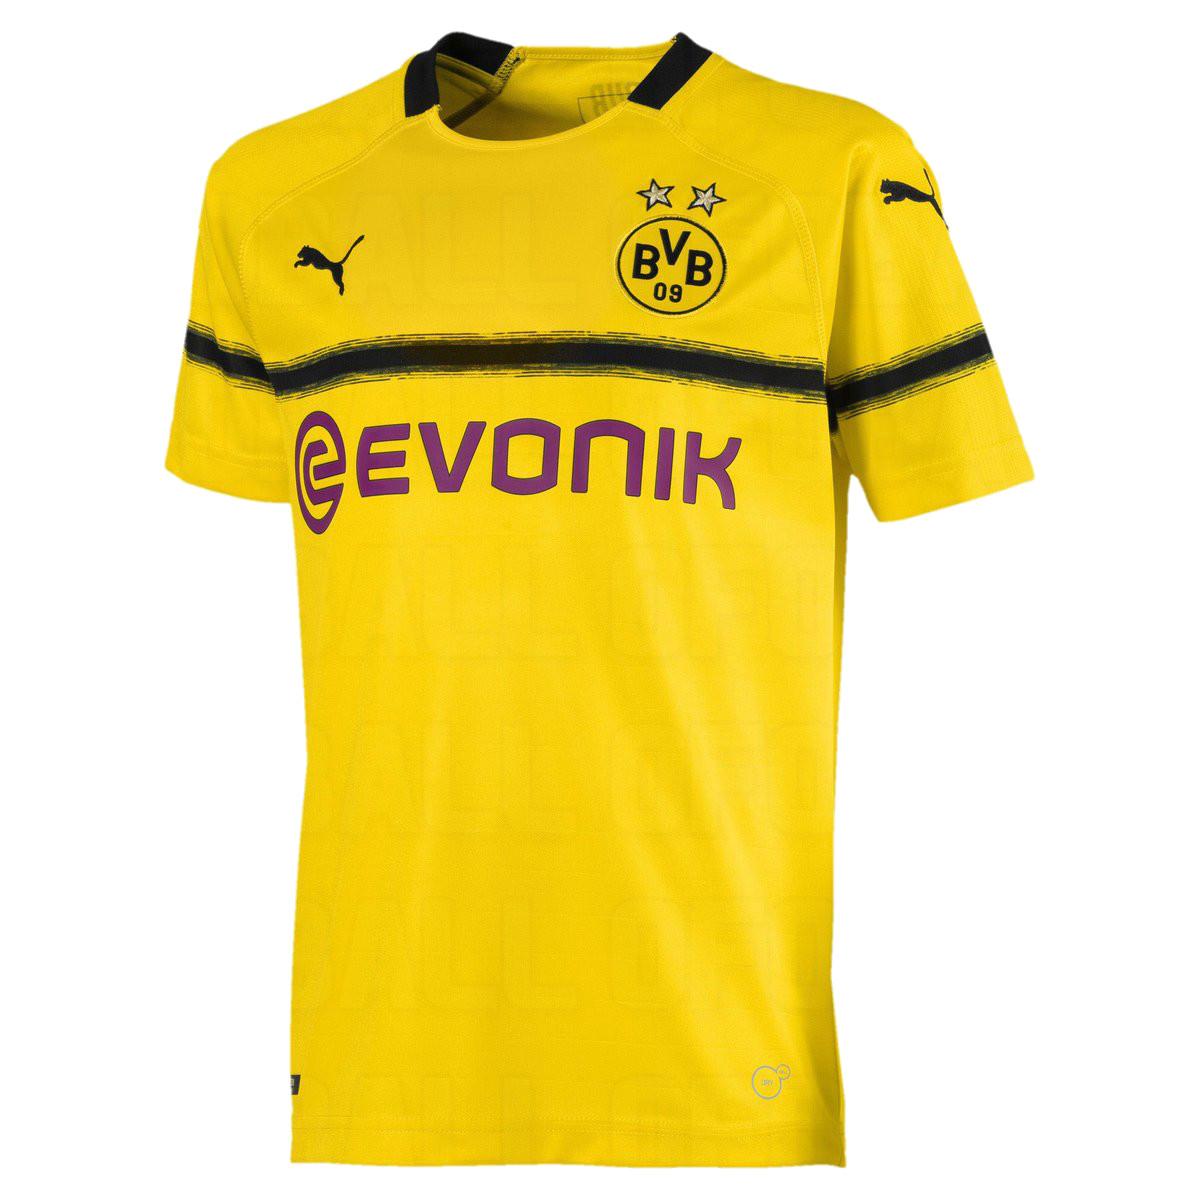 Dortmund 2019 maillot football ligue des champions 18 19 BVB